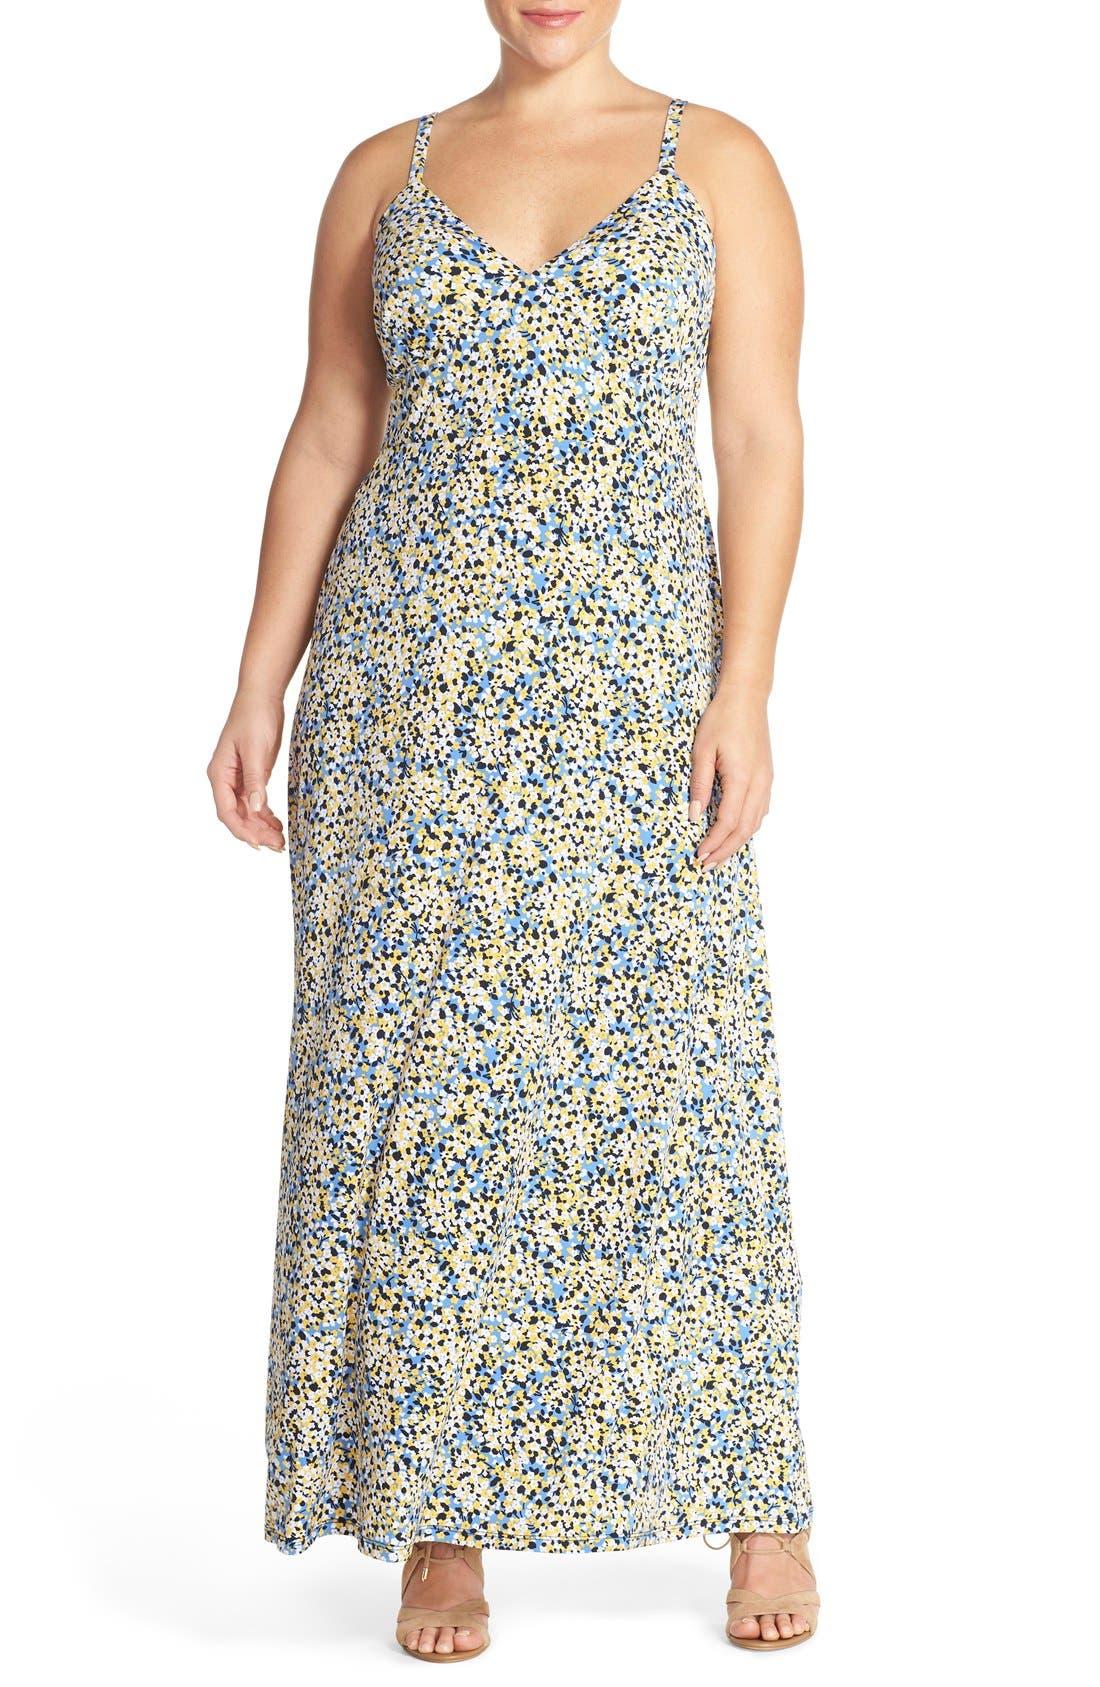 Alternate Image 1 Selected - MICHAEL Michael Kors 'Chiltington' Jersey A-Line Maxi Dress (Plus Size)